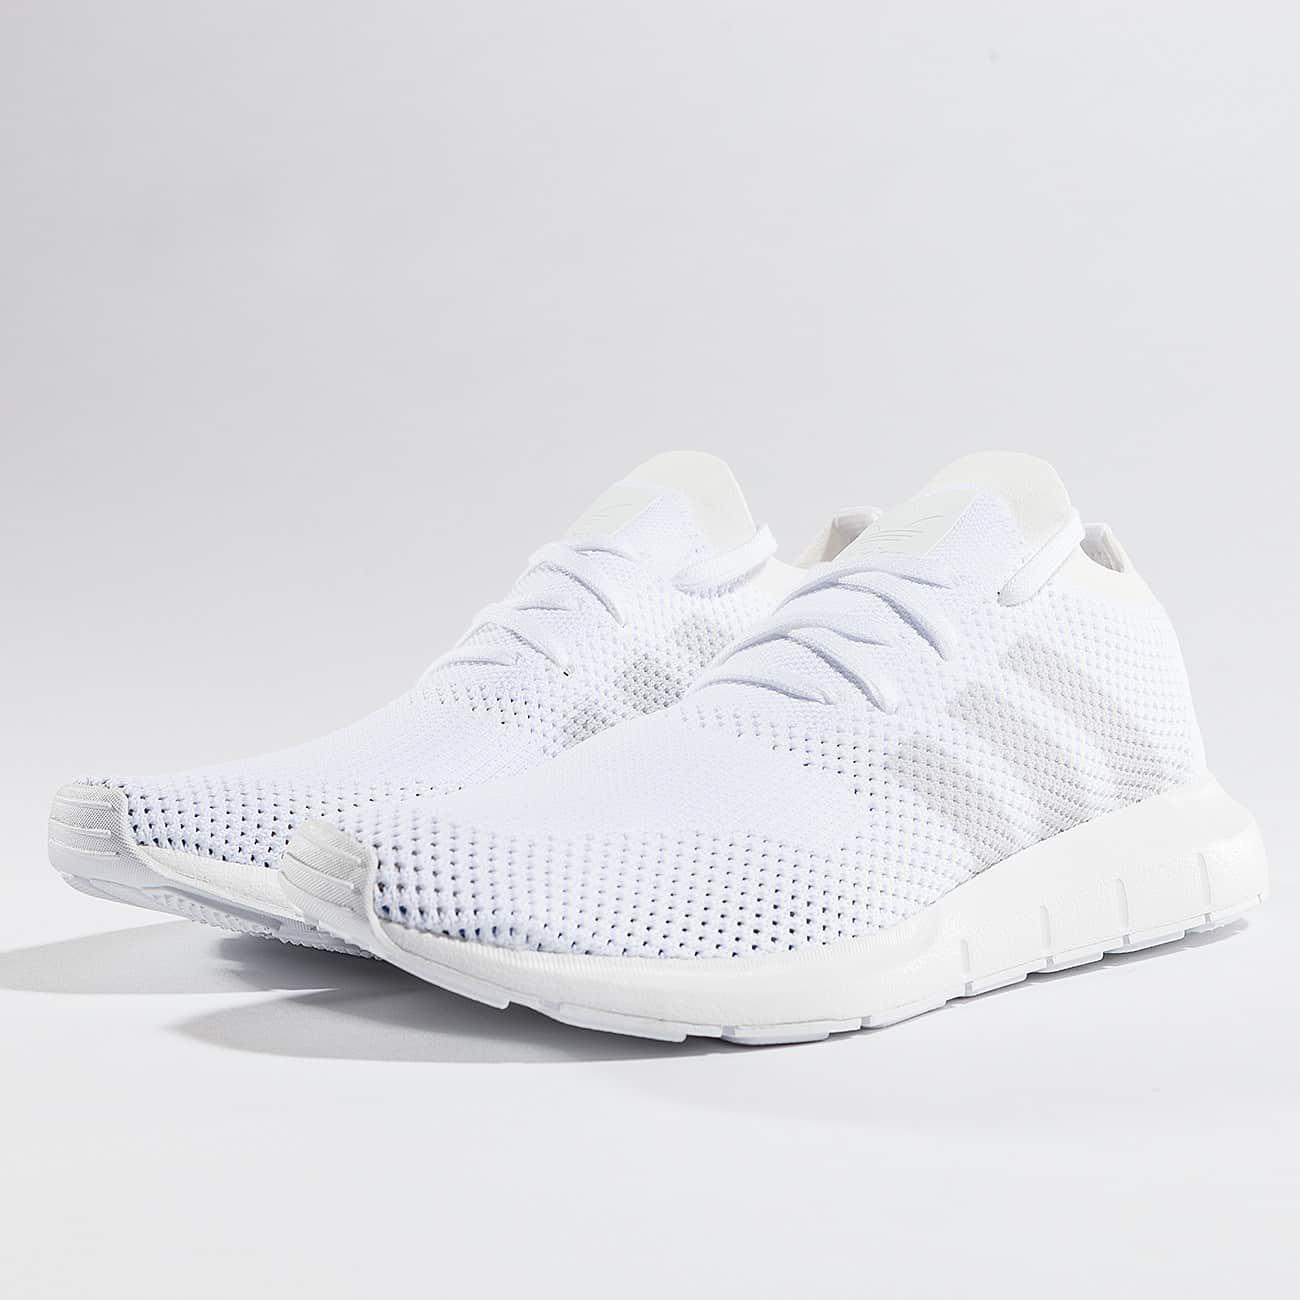 980824728b524 For Lyst Adidas Pk White Swift In Originals Sneakers Men Run SVUzMp